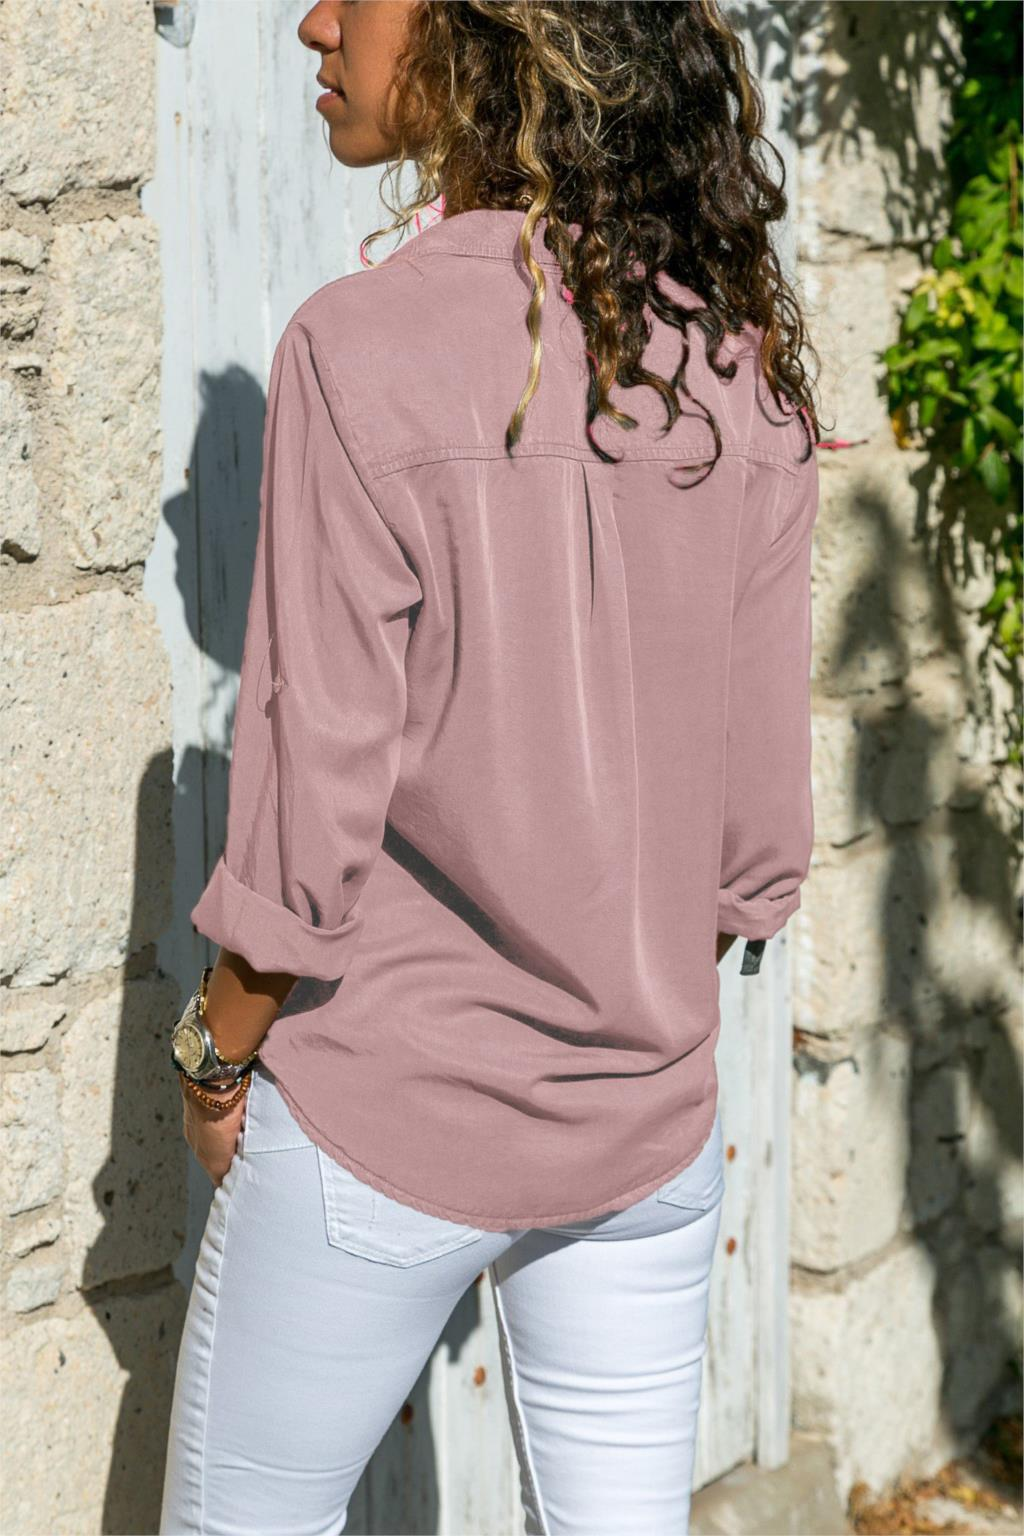 office blouse women plus size 5XL long sleeve blusas mujer de moda 2018 tallas grandes spring autumn shirt top women blouse8